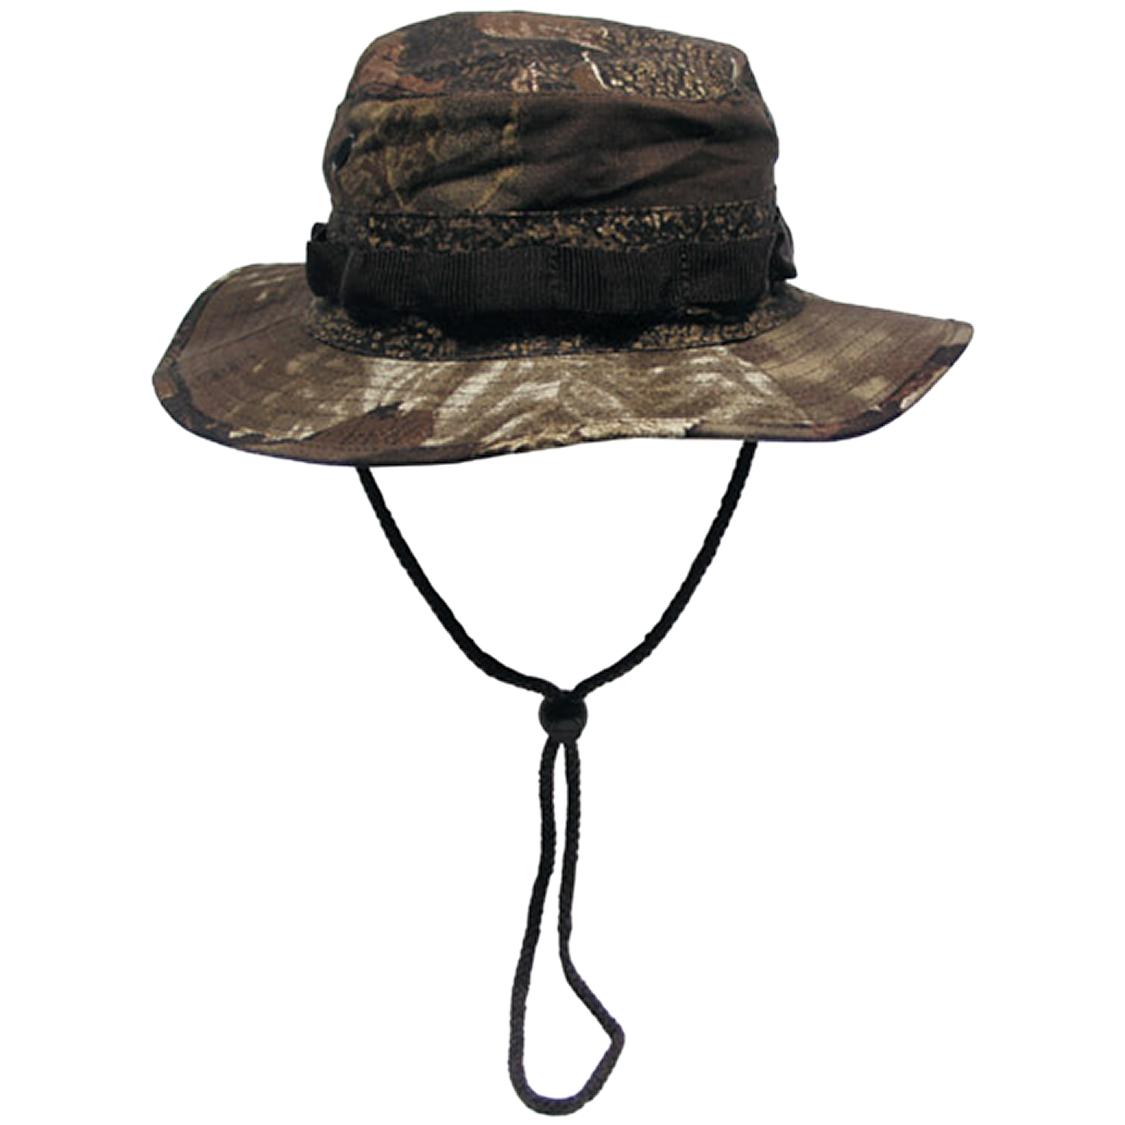 US-GI-Ripstop-Bush-Boonie-Hat-Army-Fishing-Hunter-Cap-Real-Tree-Brown-Camo-S-XL